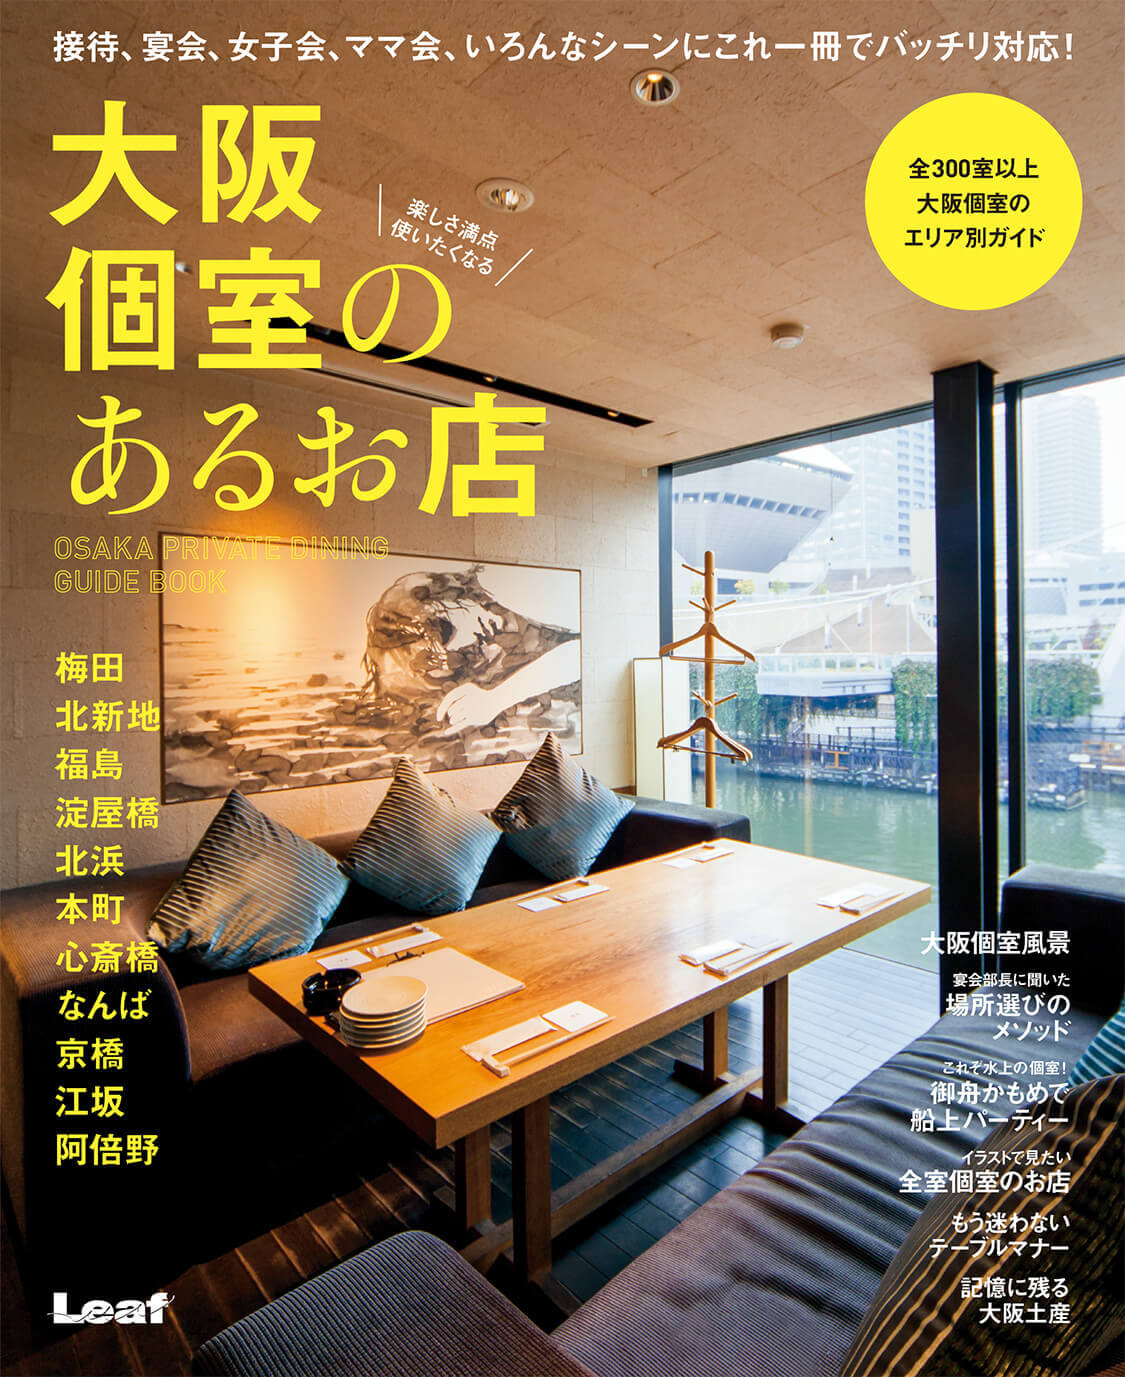 LeafMOOK 【書籍】大阪 個室のあるお店